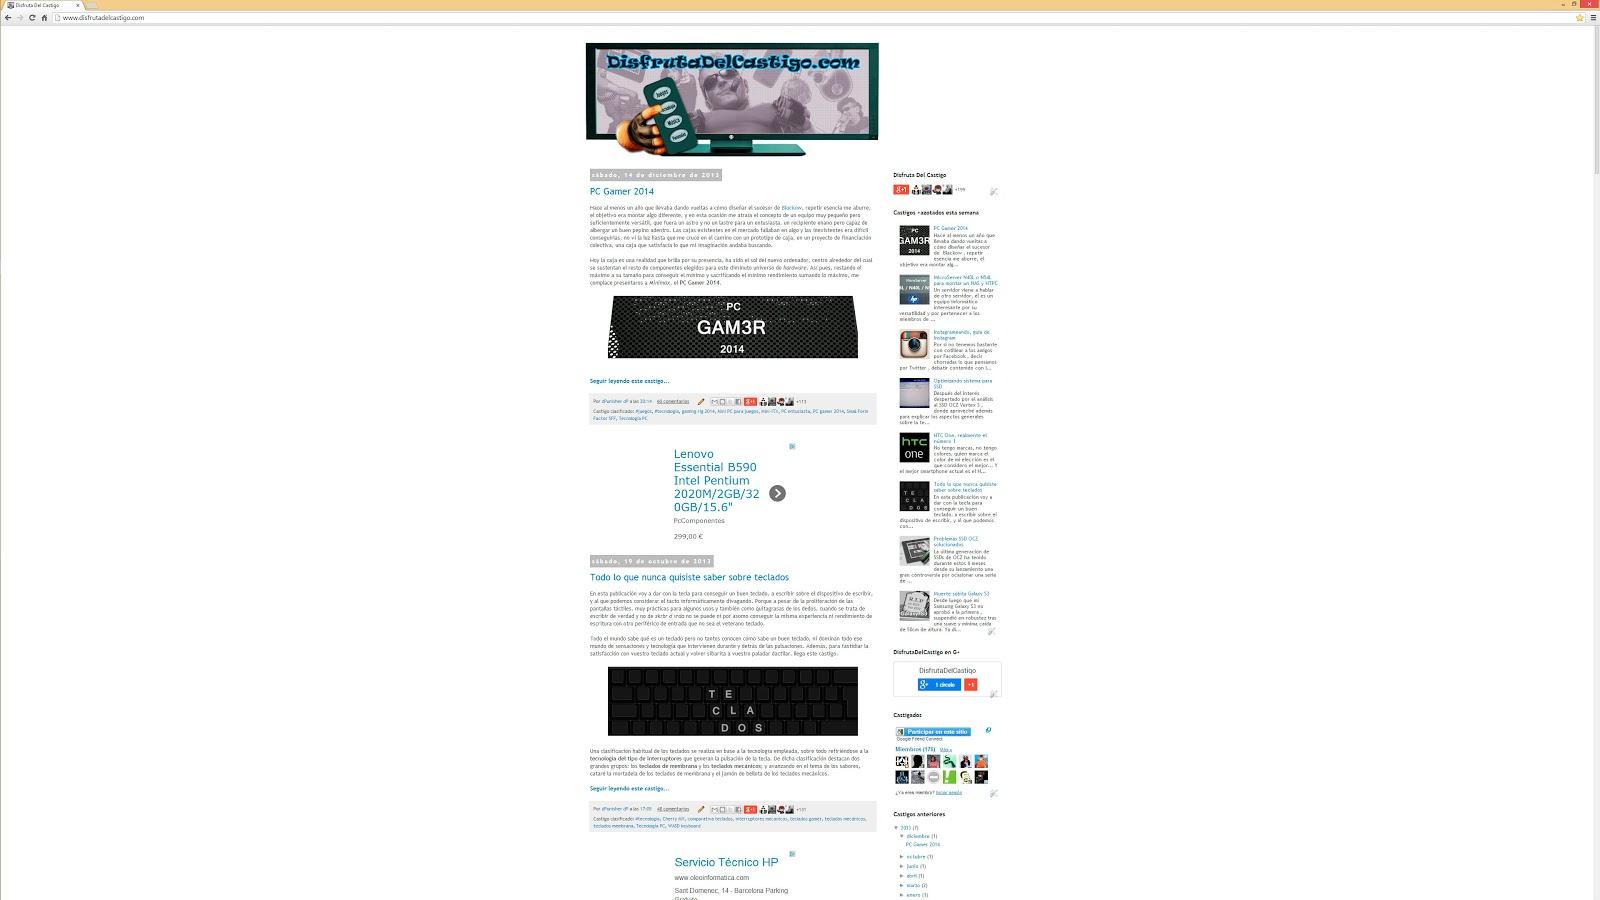 Web a 2160p (4K UHD) - comparativa con 1080p y 1440p